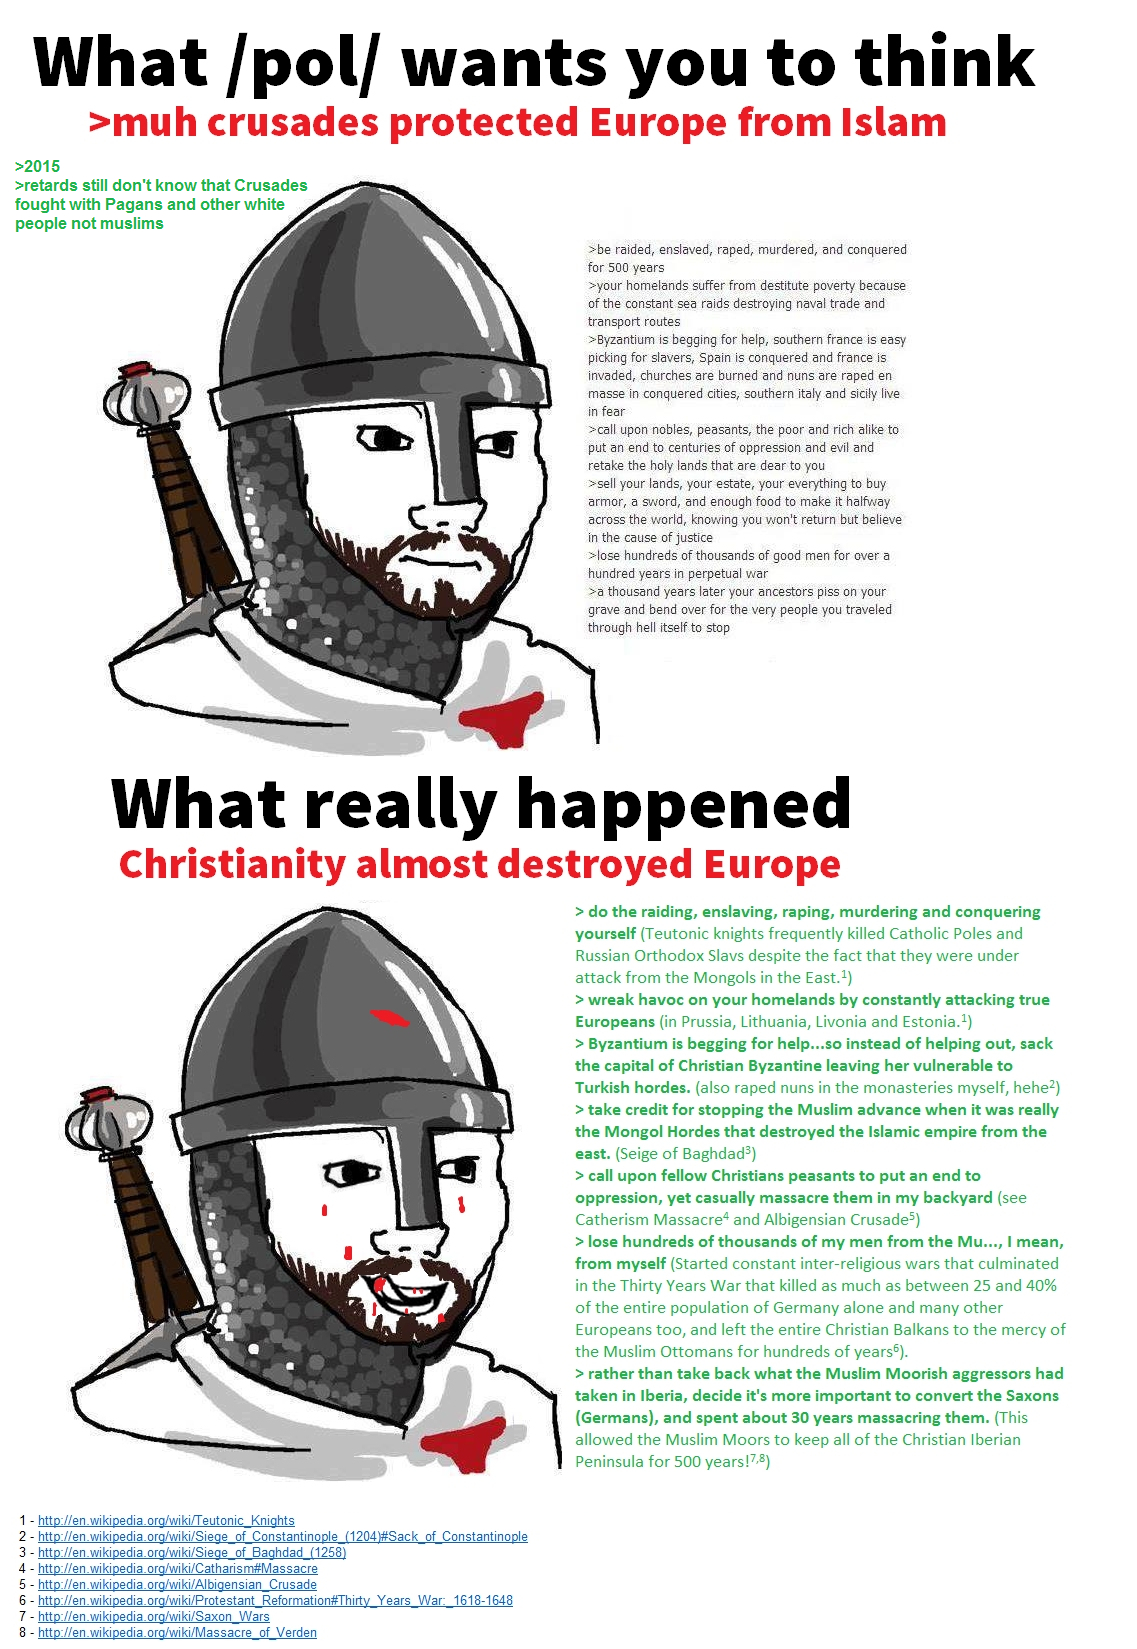 Crusades According To /pol/